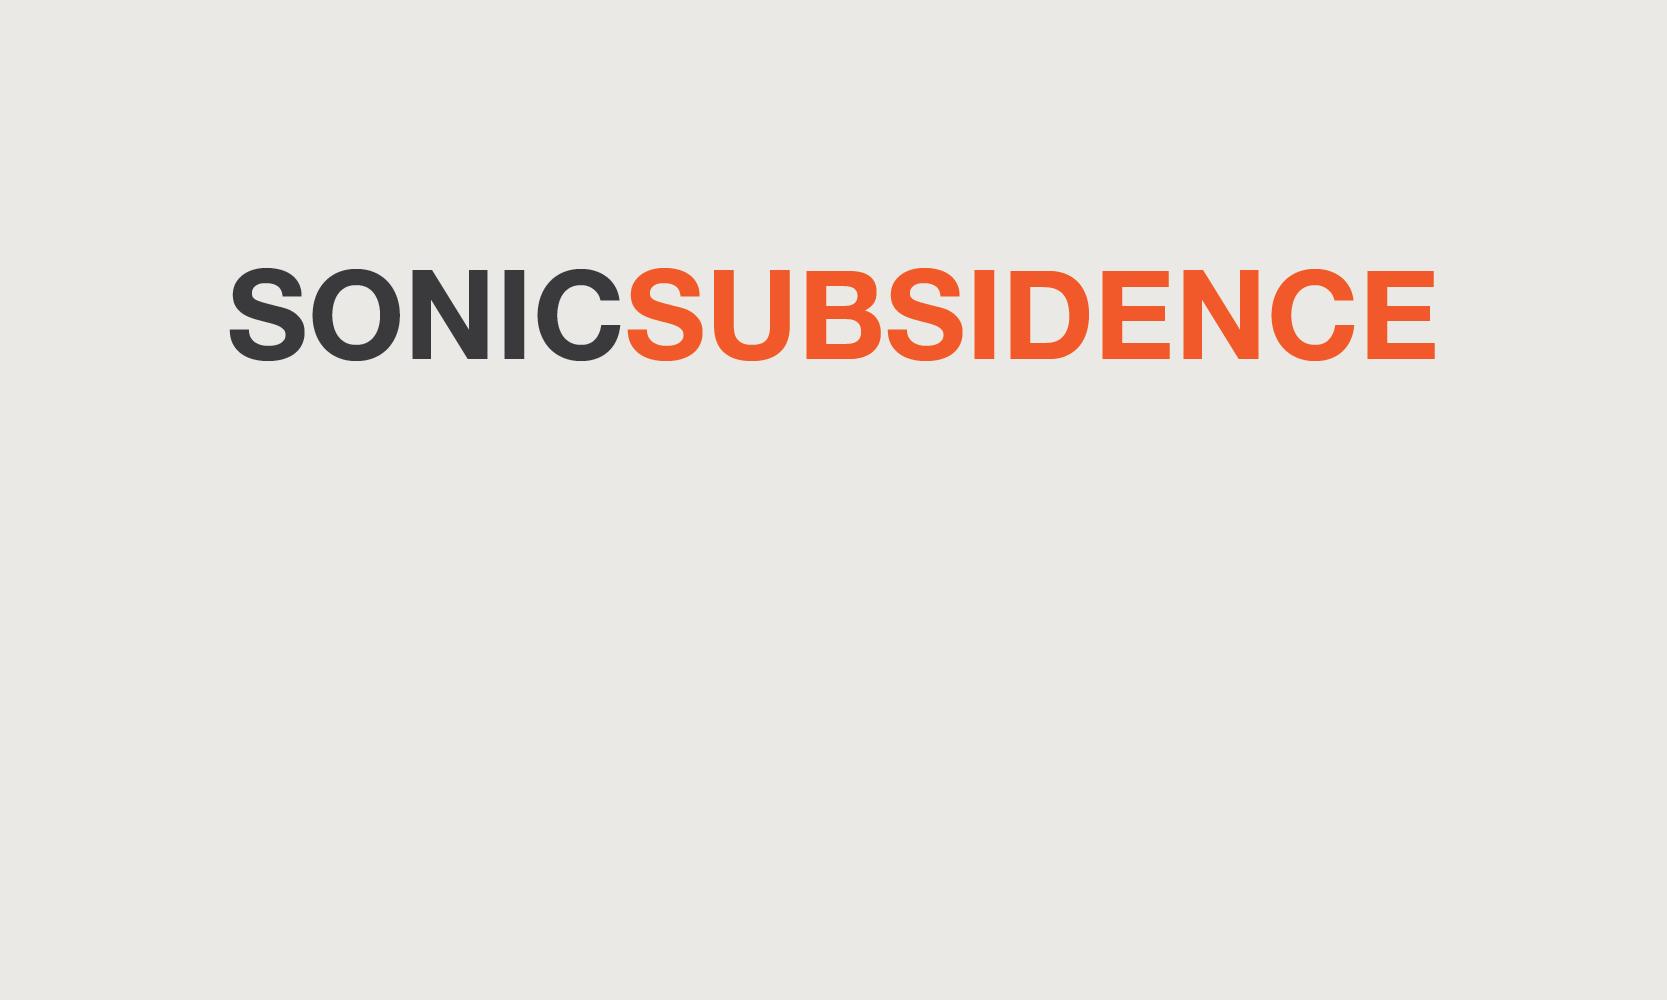 sonicsubsidence